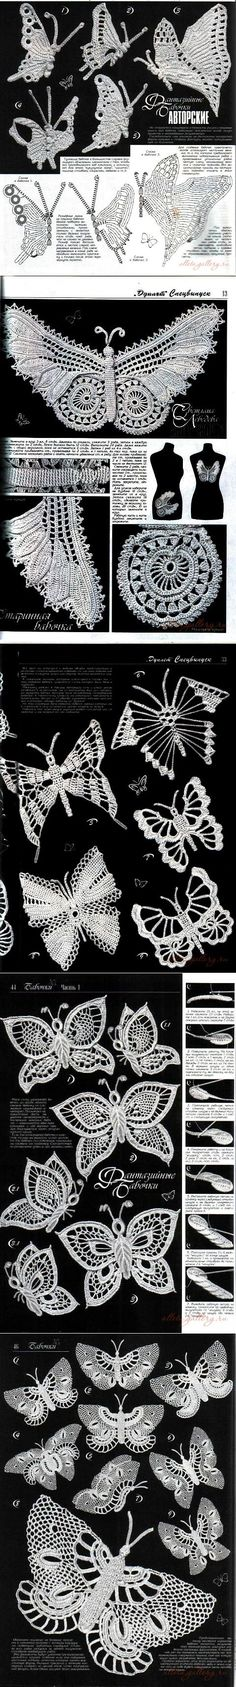 Colección de punto mariposas. Parte 1 ..